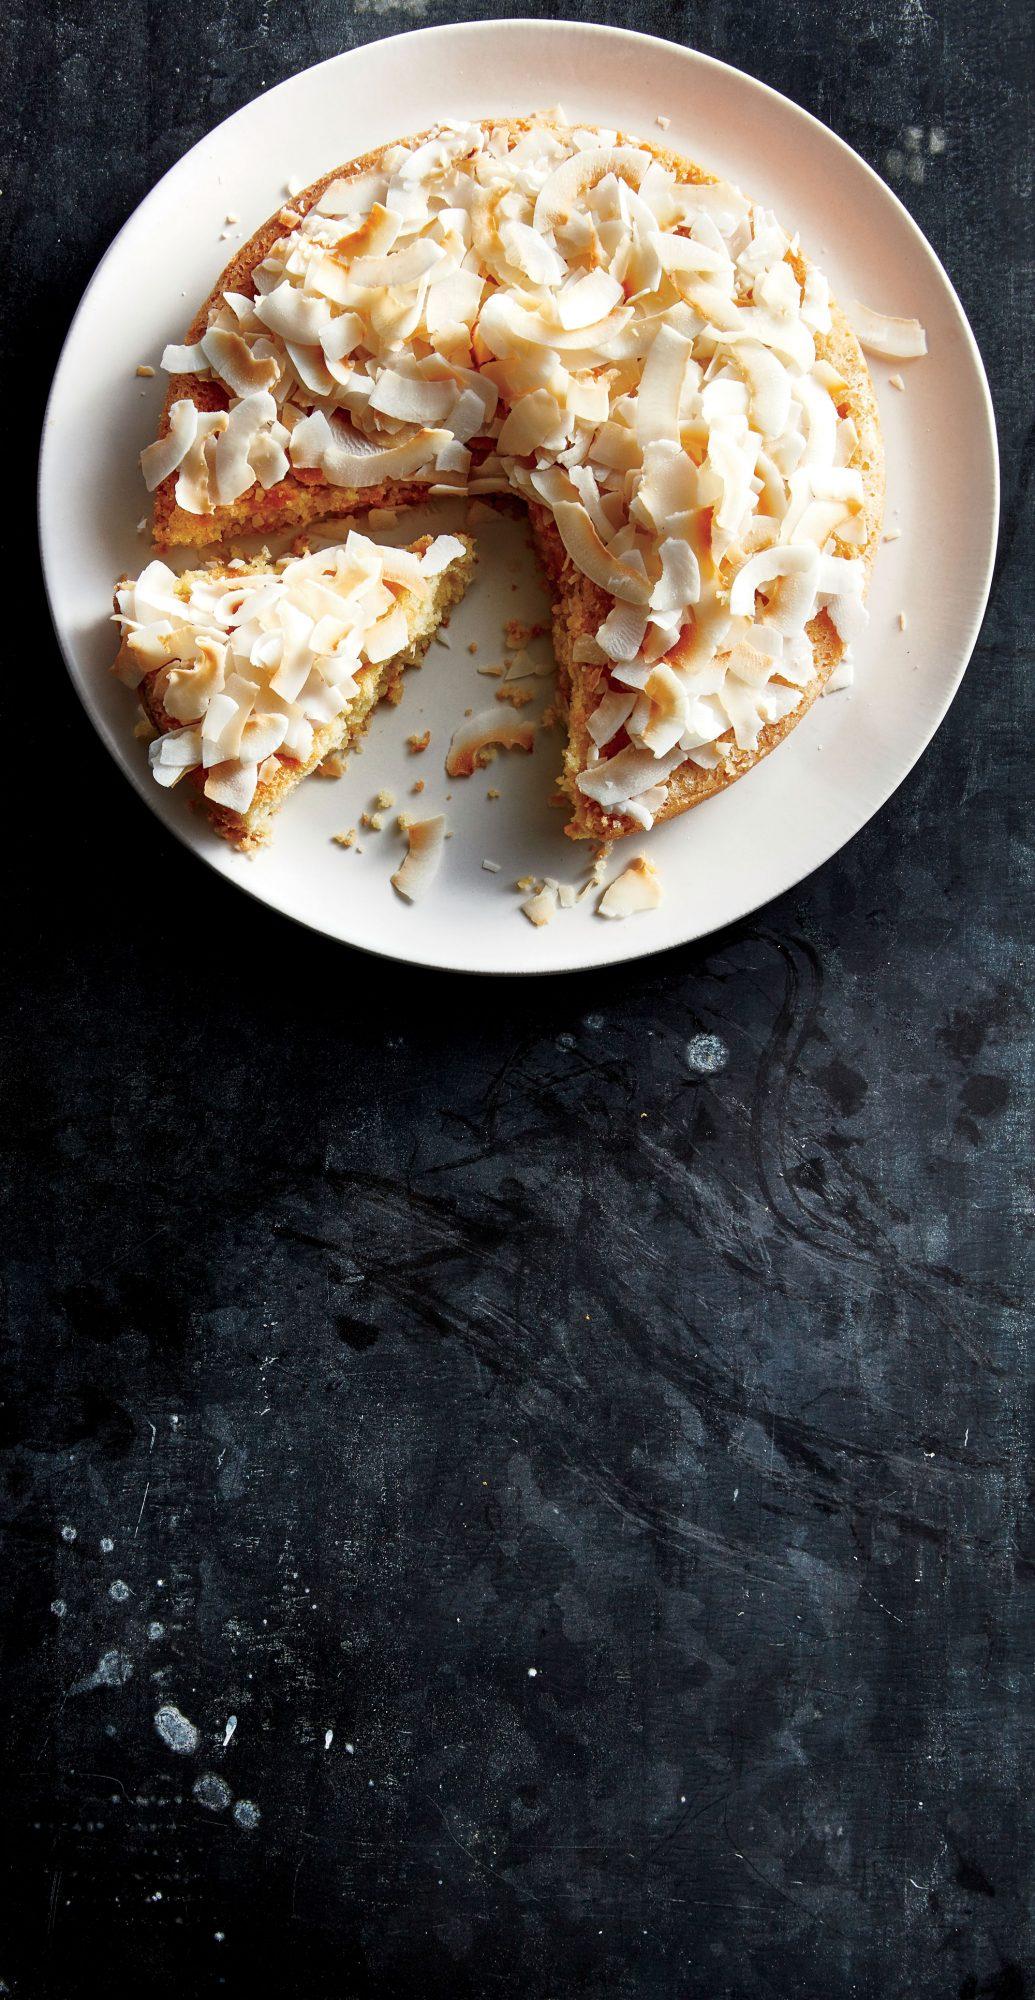 Macadamia-Almond Cake